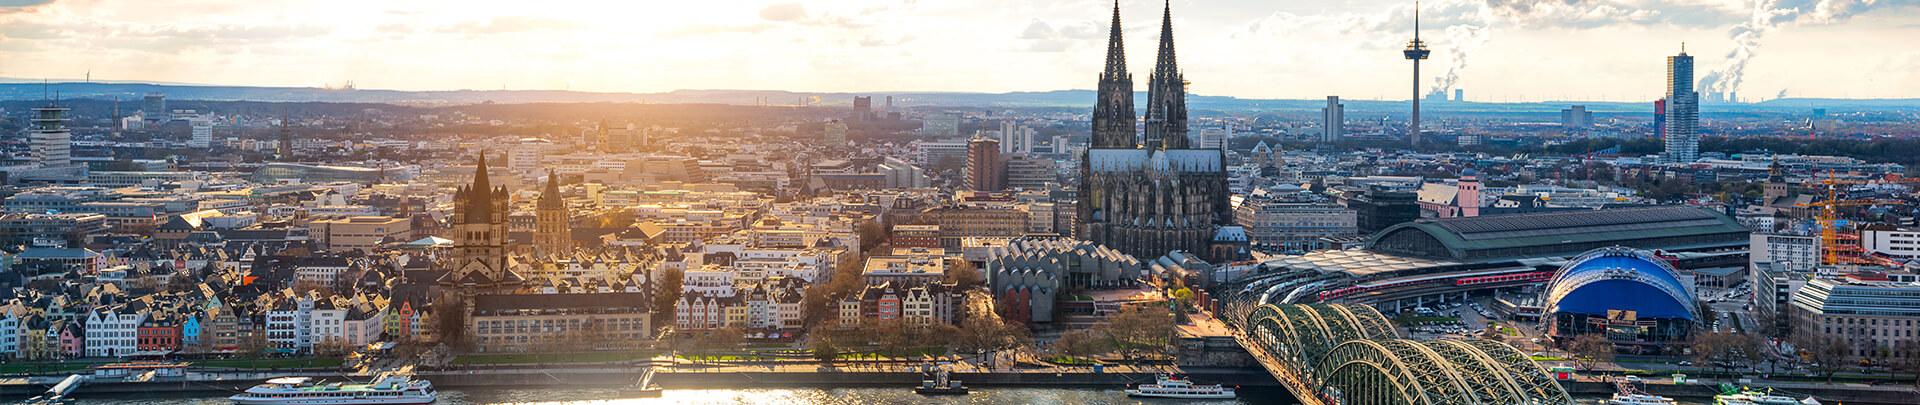 Köln und Kölner Dom